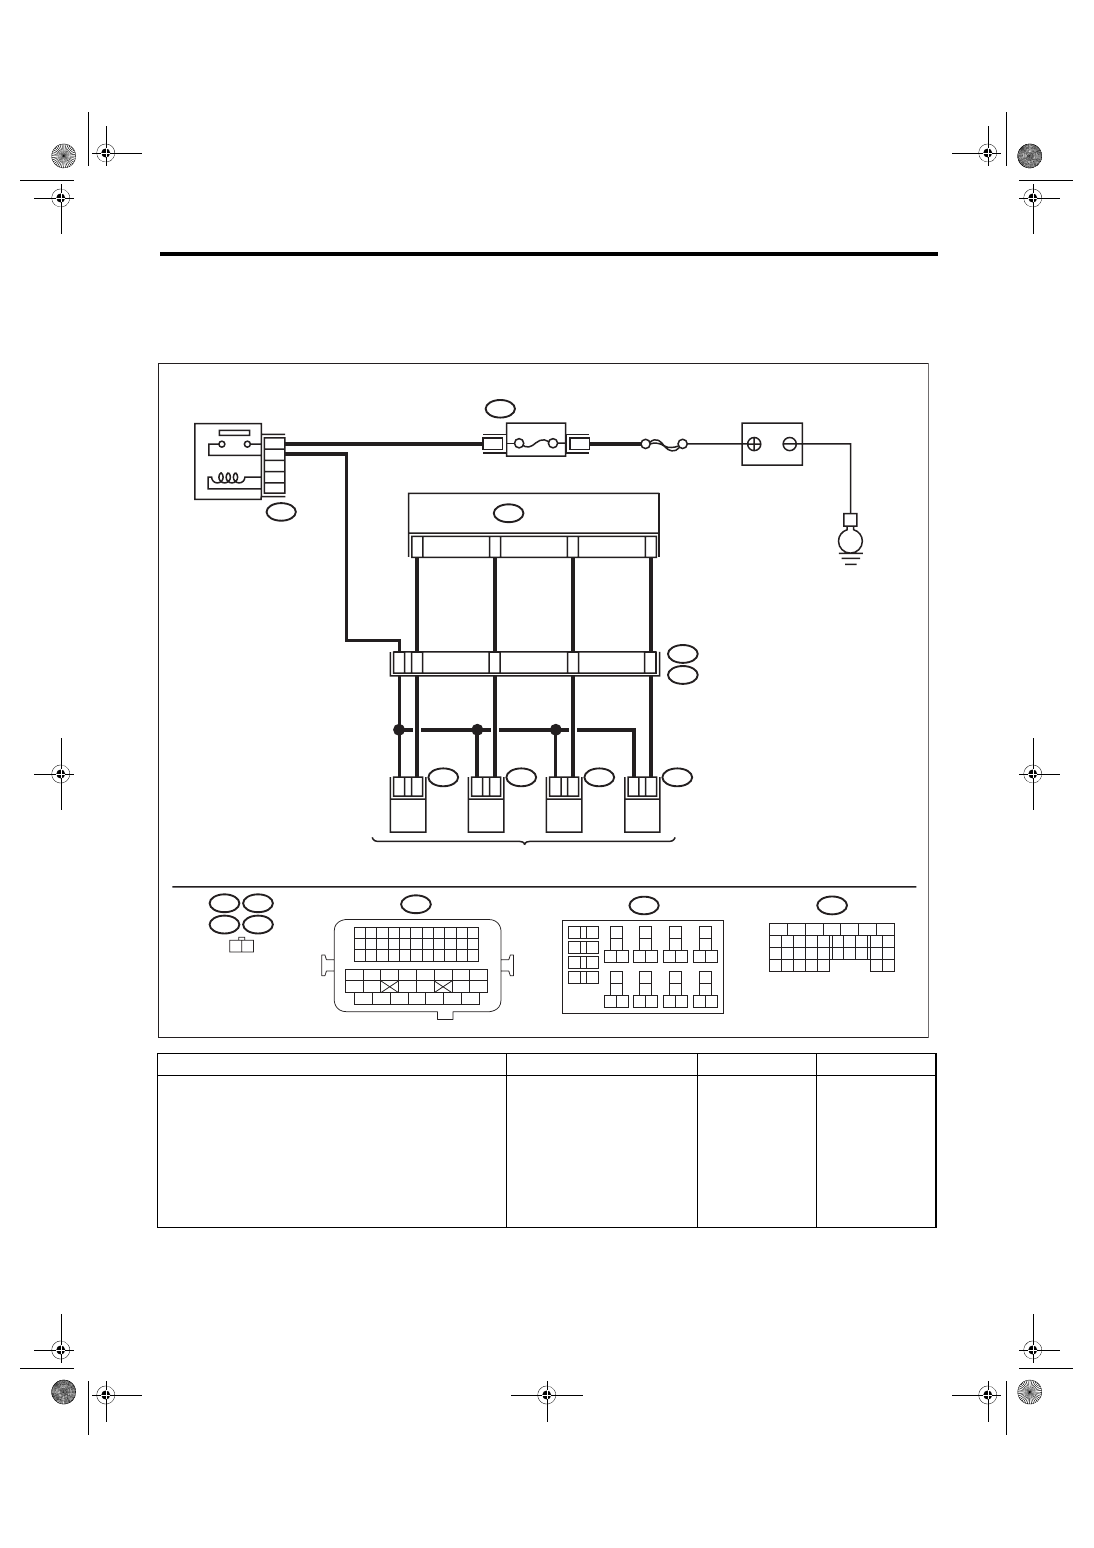 Subaru Impreza 3 / Impreza WRX / Impreza WRX STI  Manual